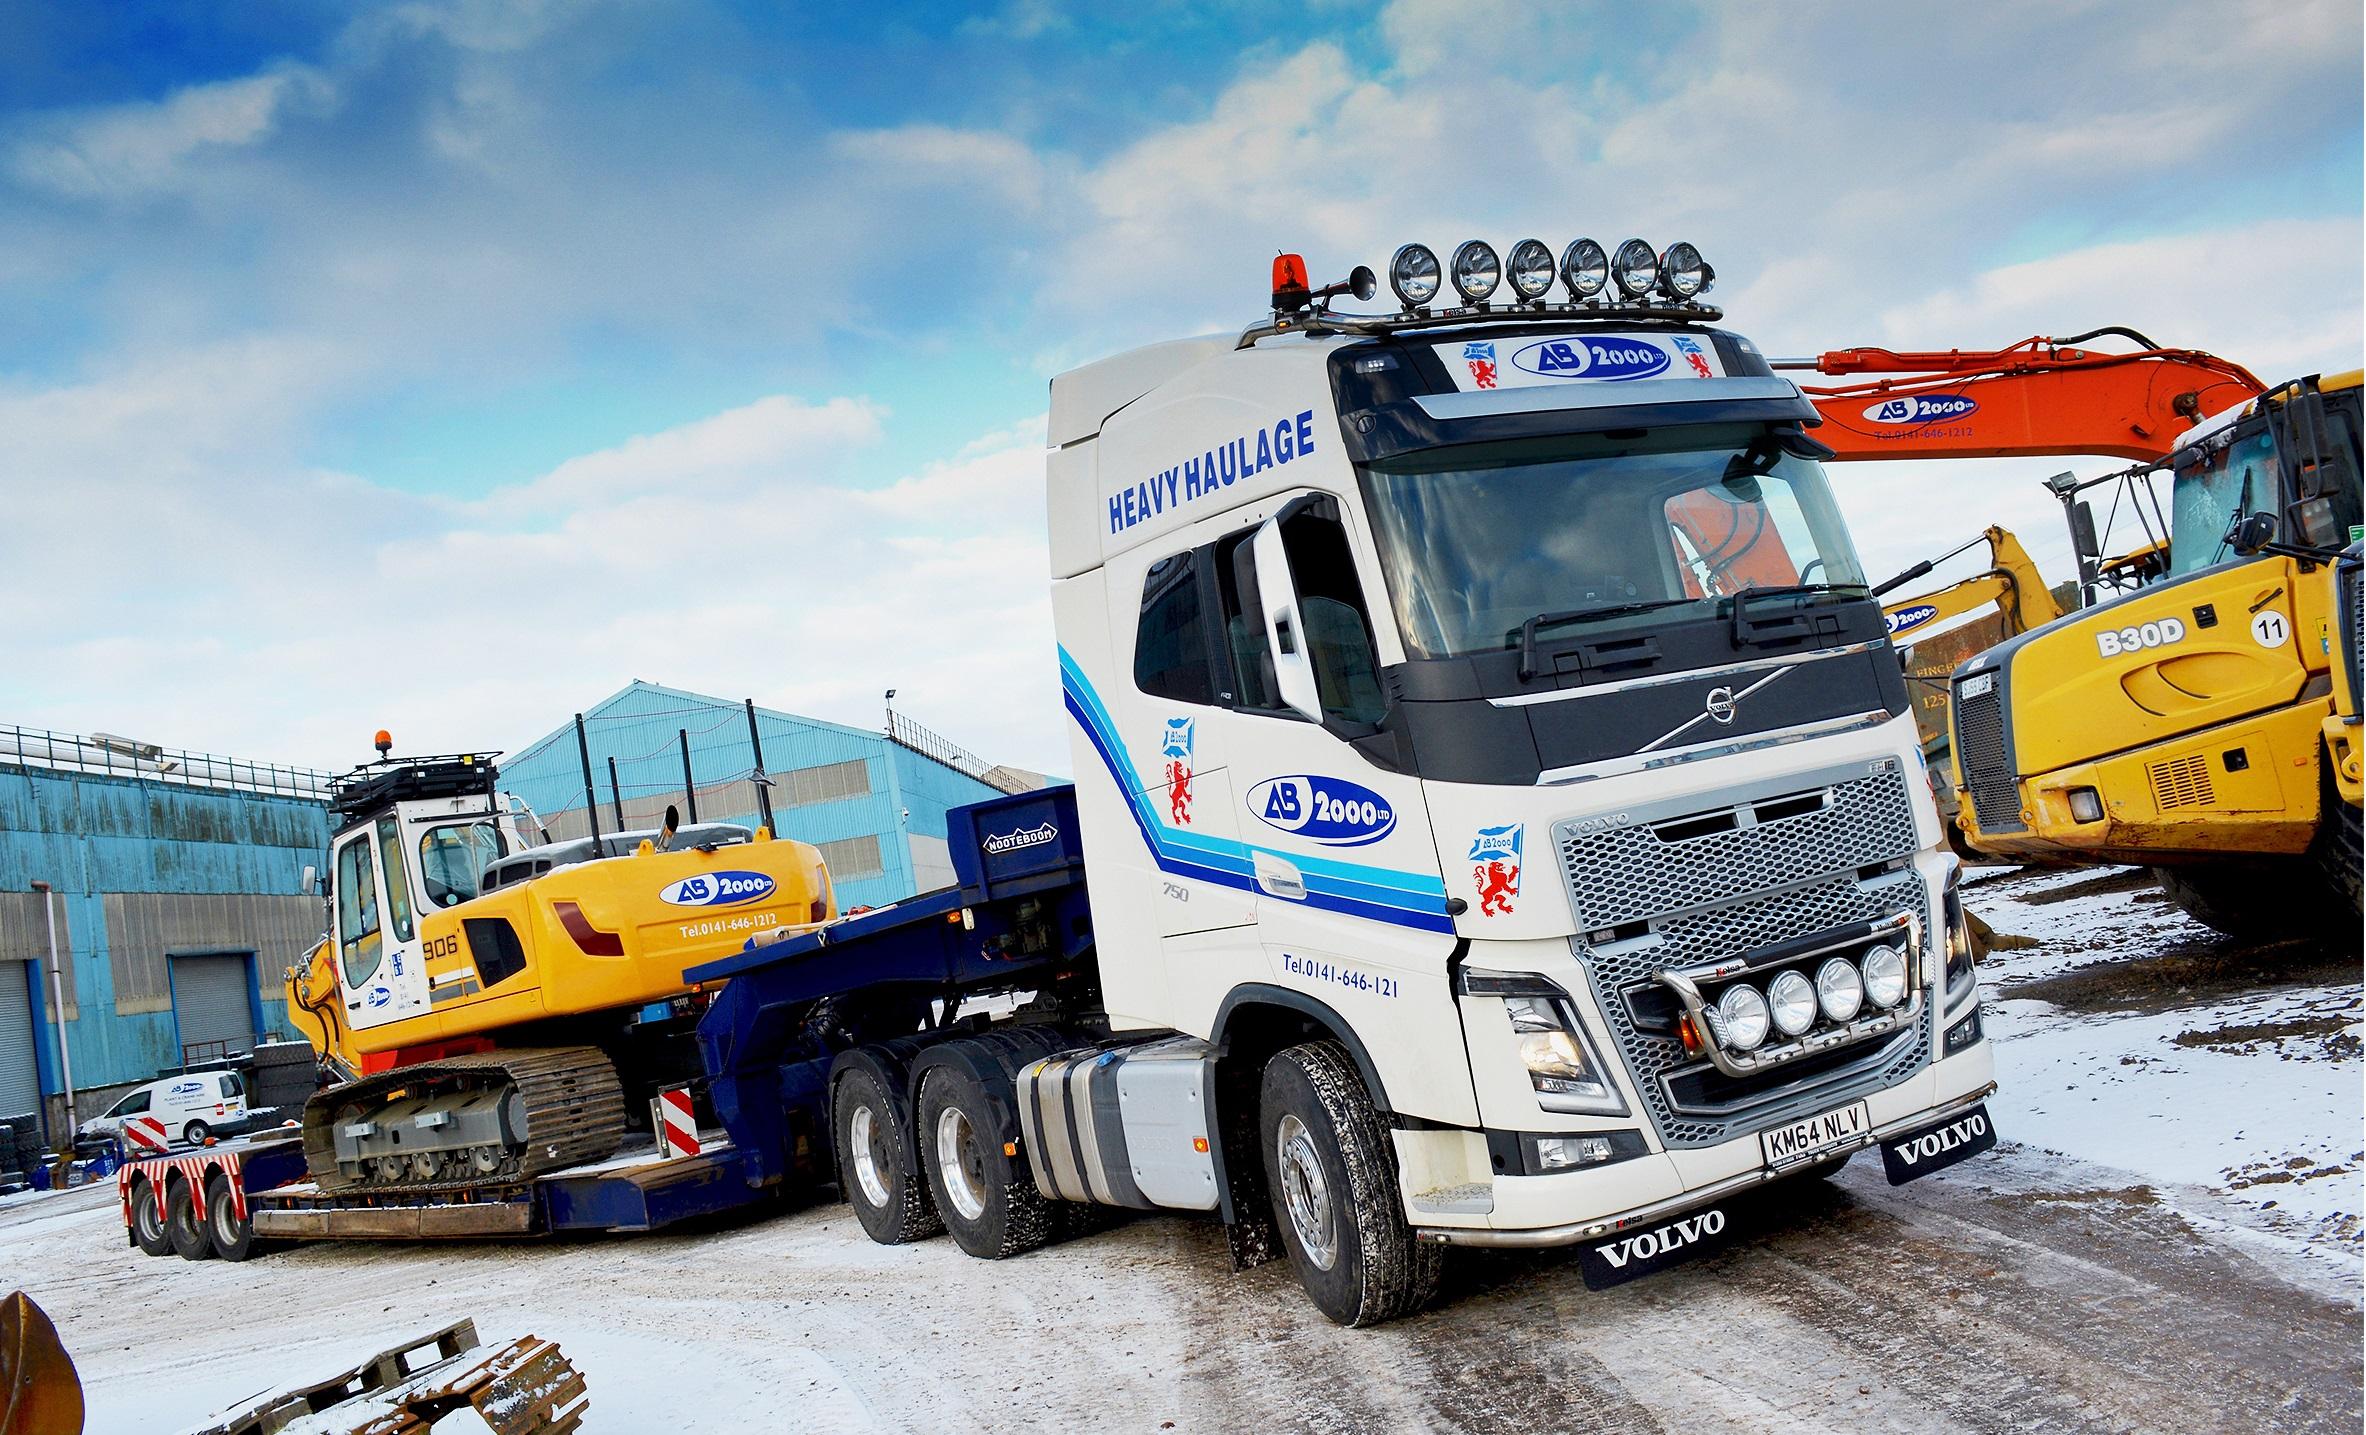 AB2000 celebrate twentieth with Volvo FH16-750 fast response flagships | Trucks UK Haulier